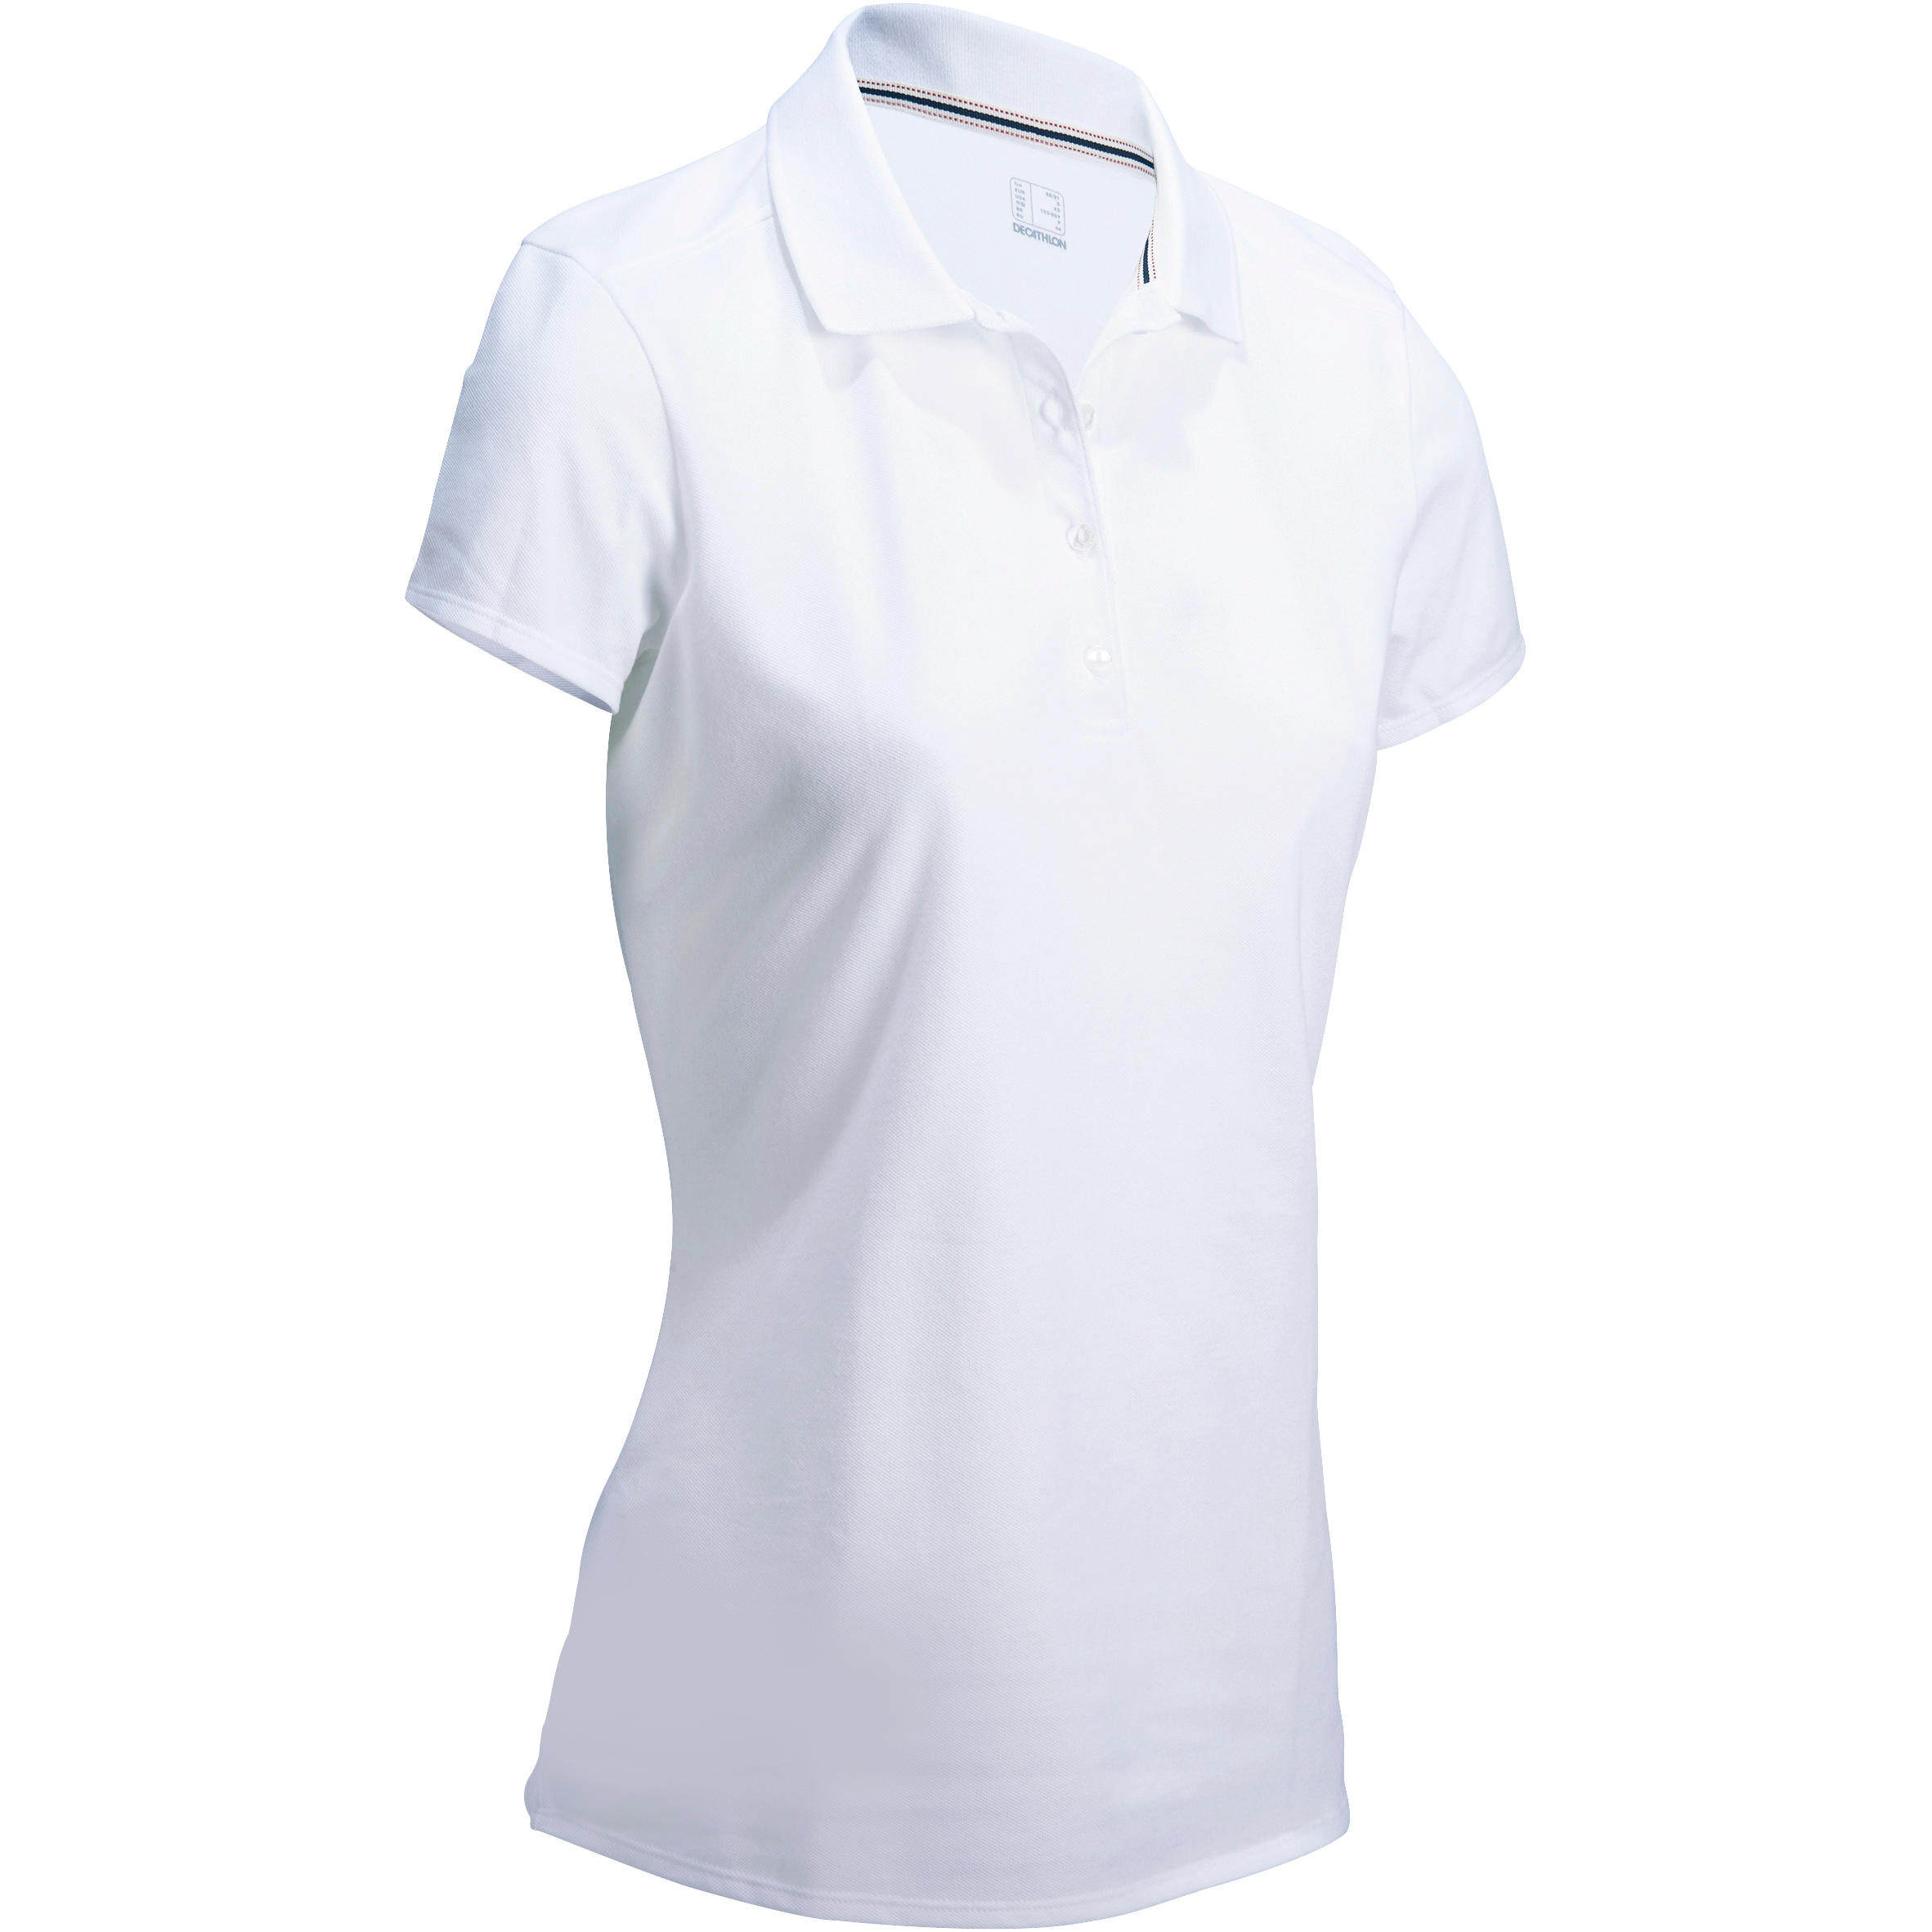 Inesis Golfpolo 500 voor dames